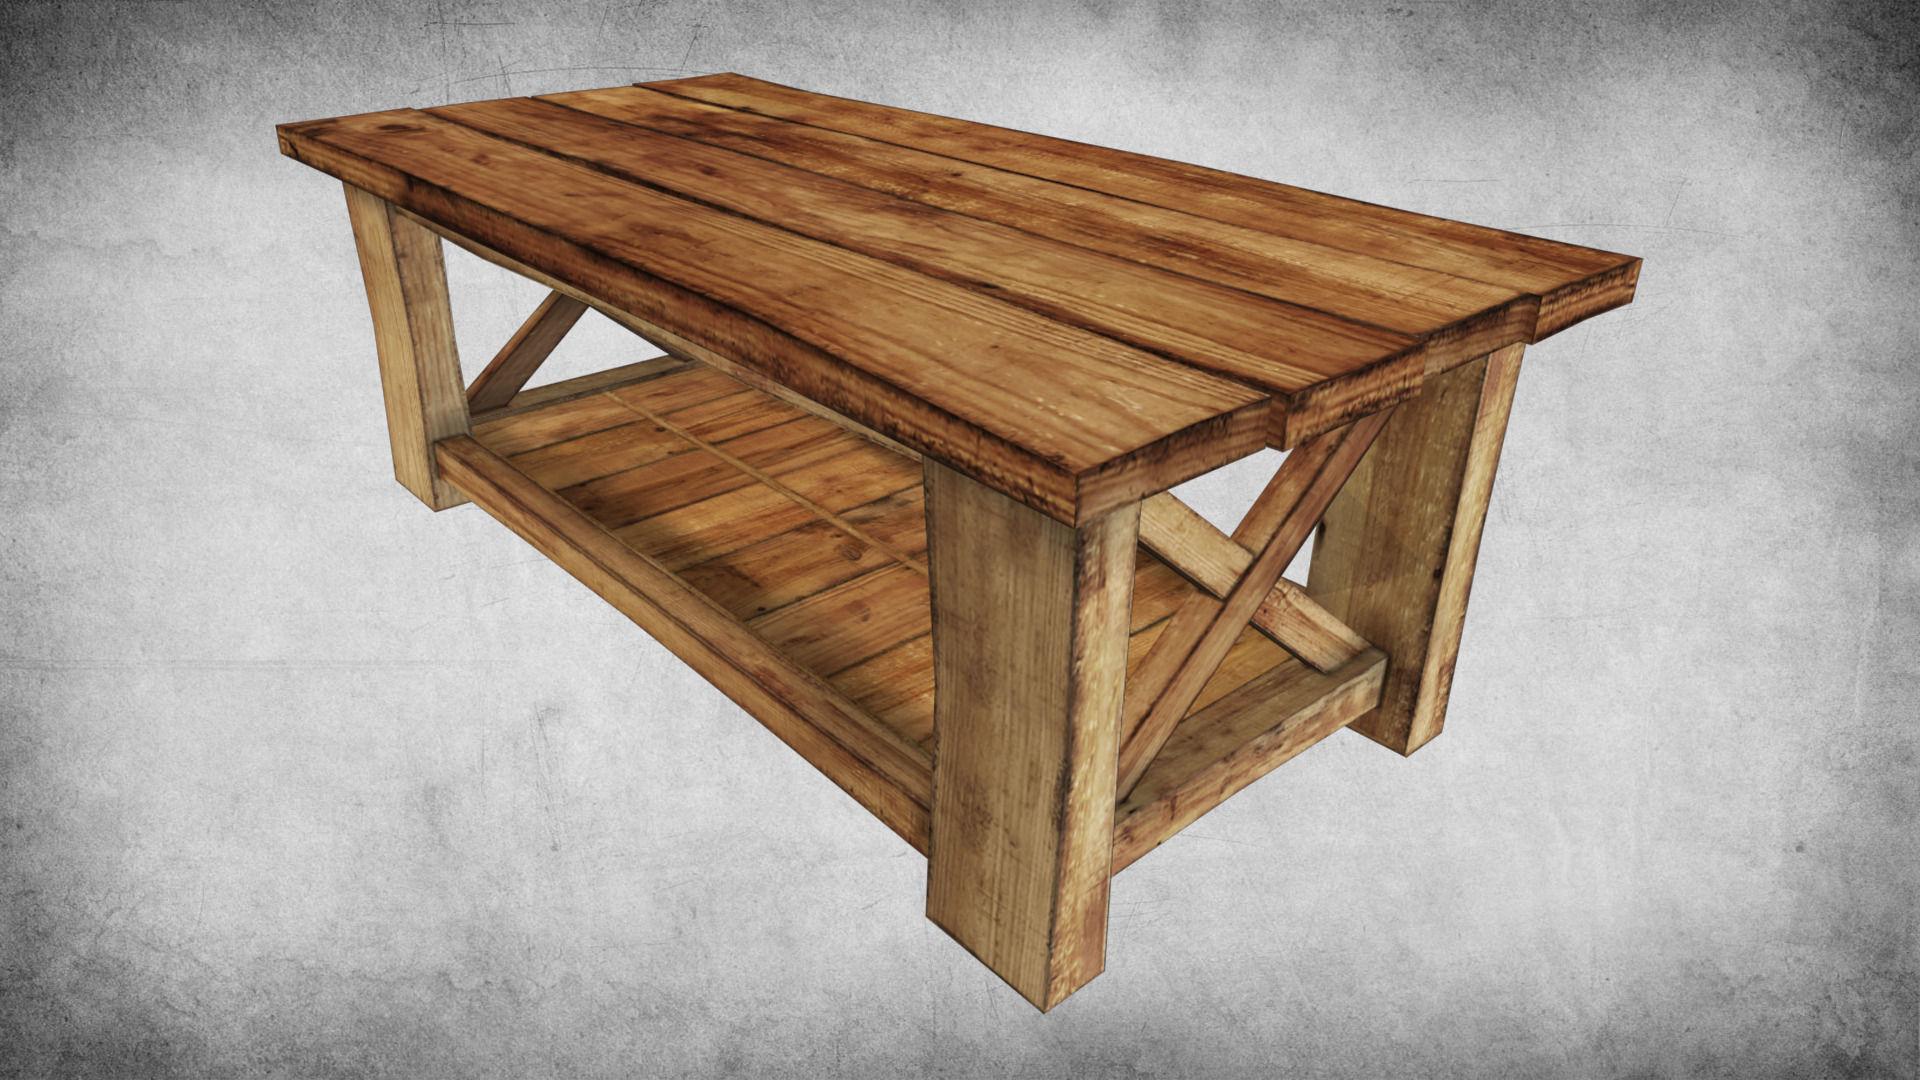 ... Rustic Wood Table 02 3d Model Low Poly Max Obj 3ds Fbx Dae W3d 2 ...